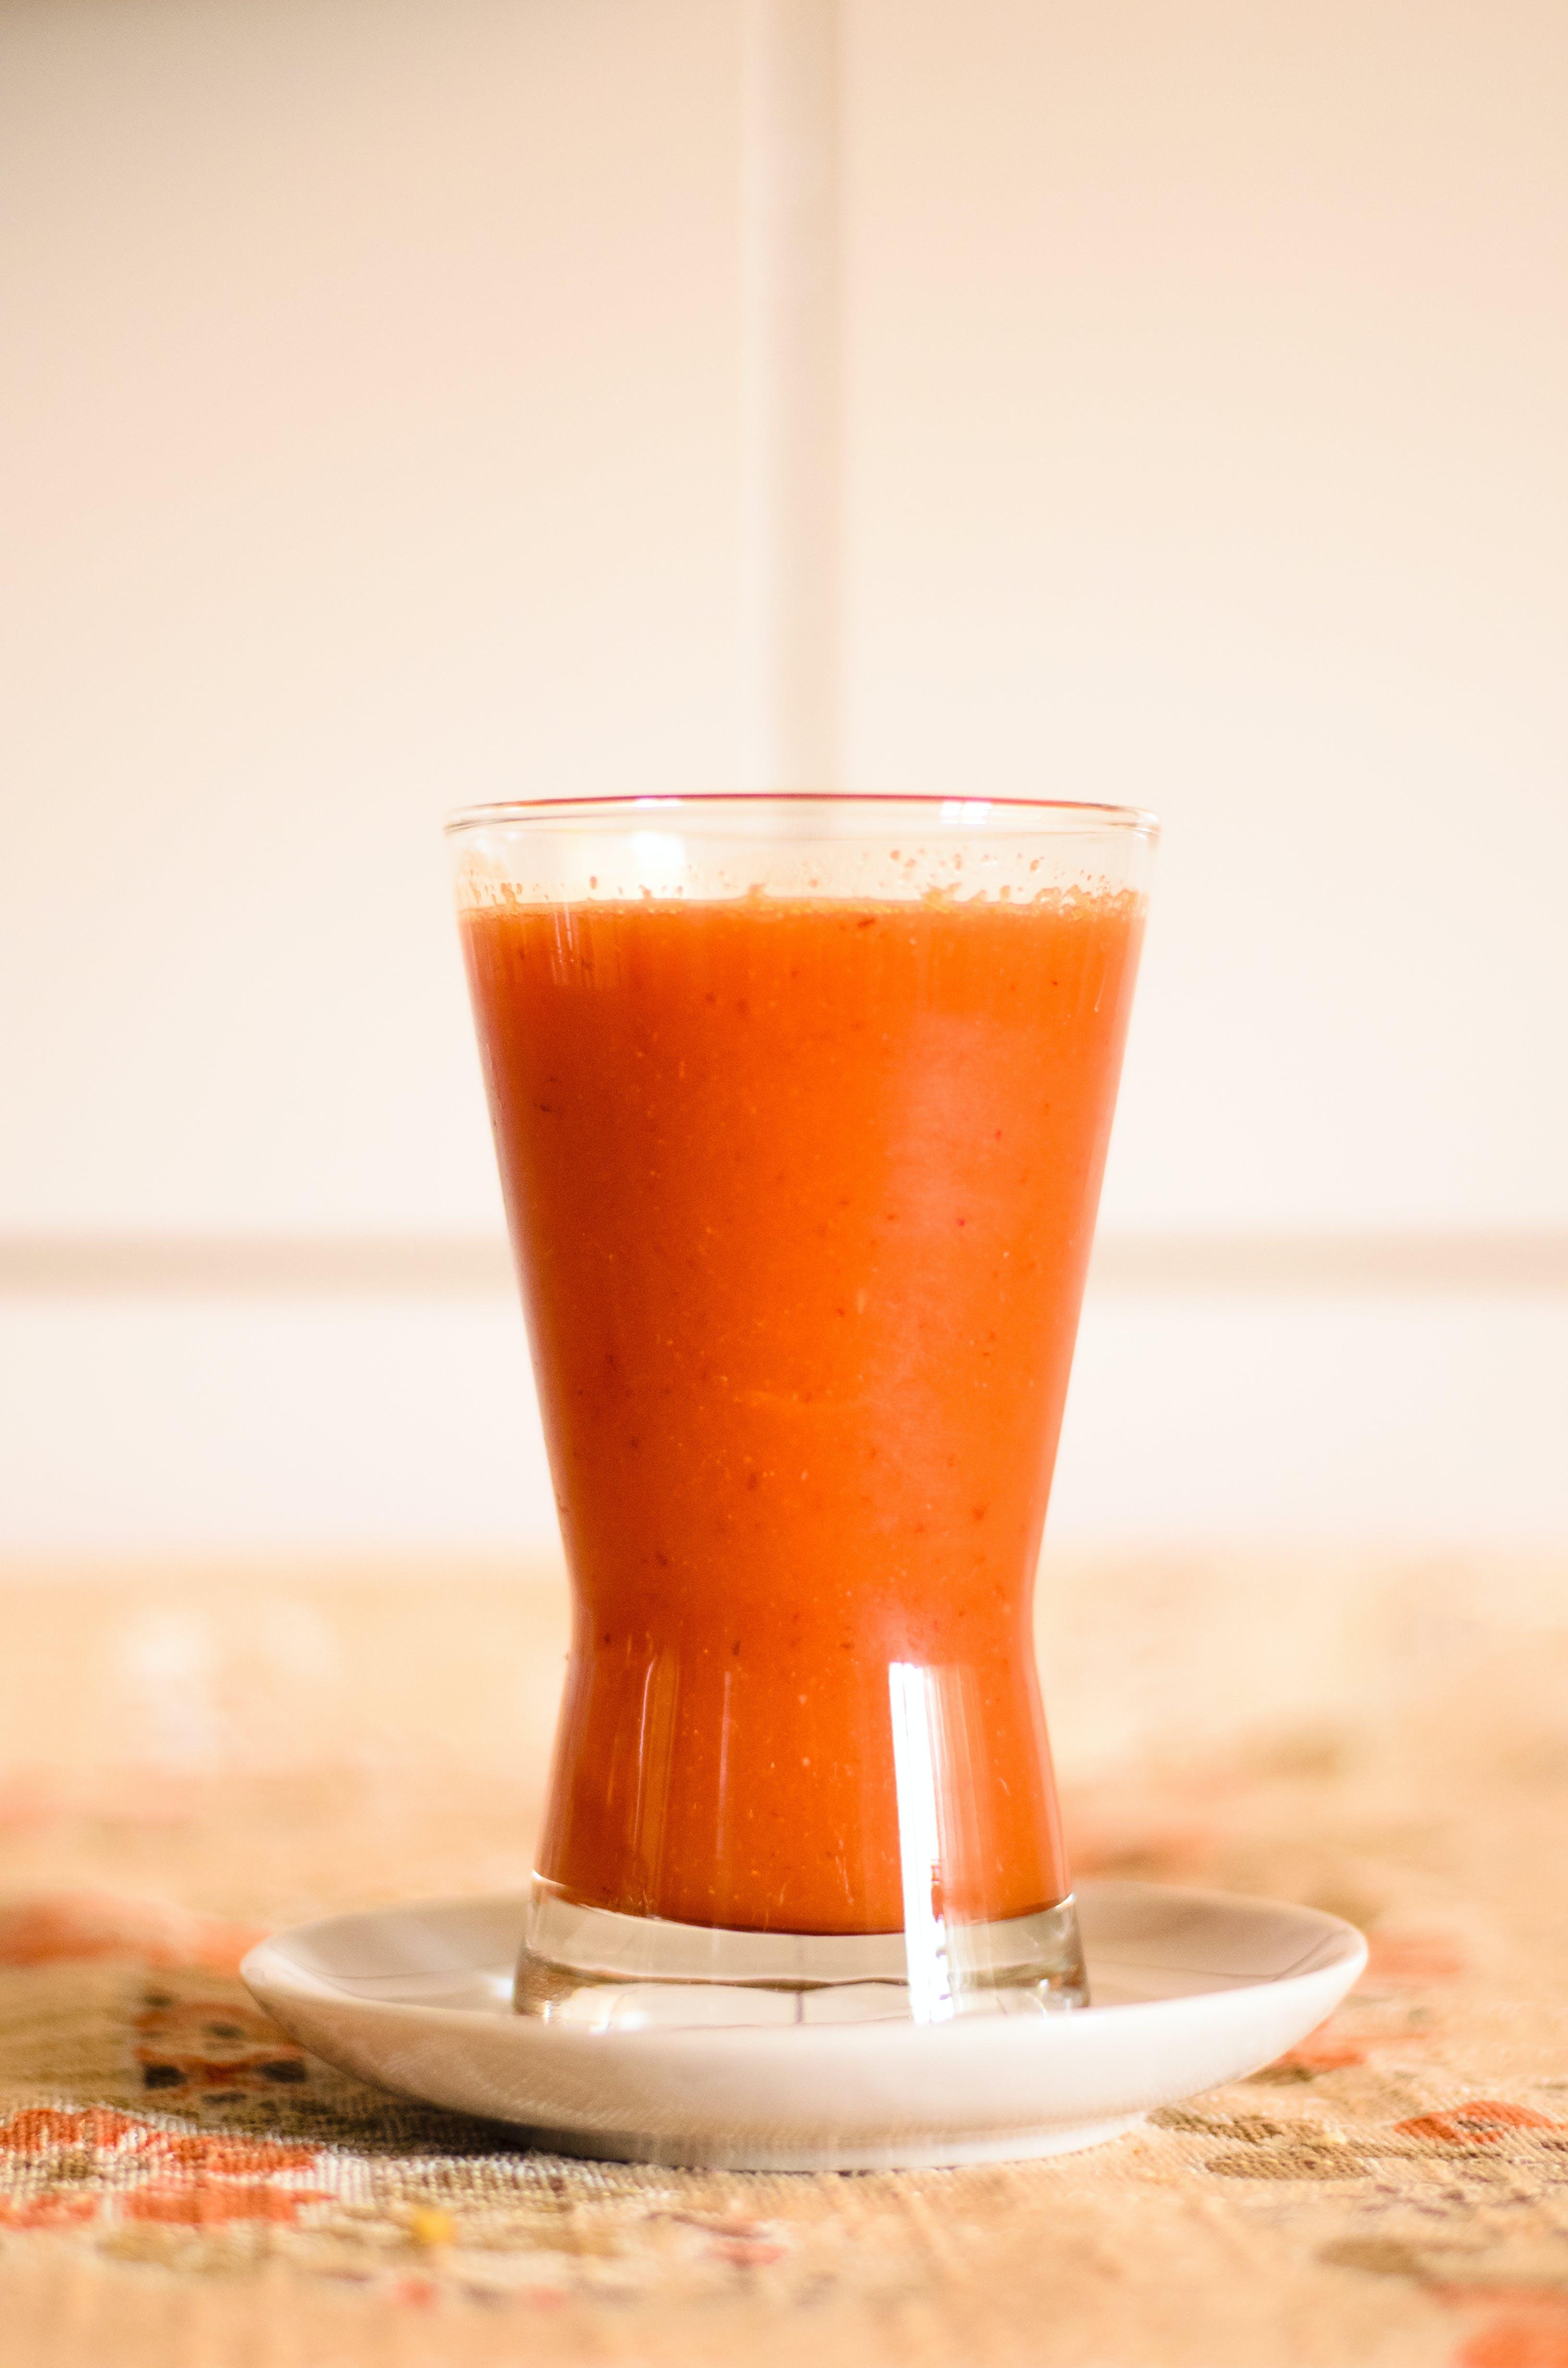 Free stock photo of drink, fruit, beverage, liquid